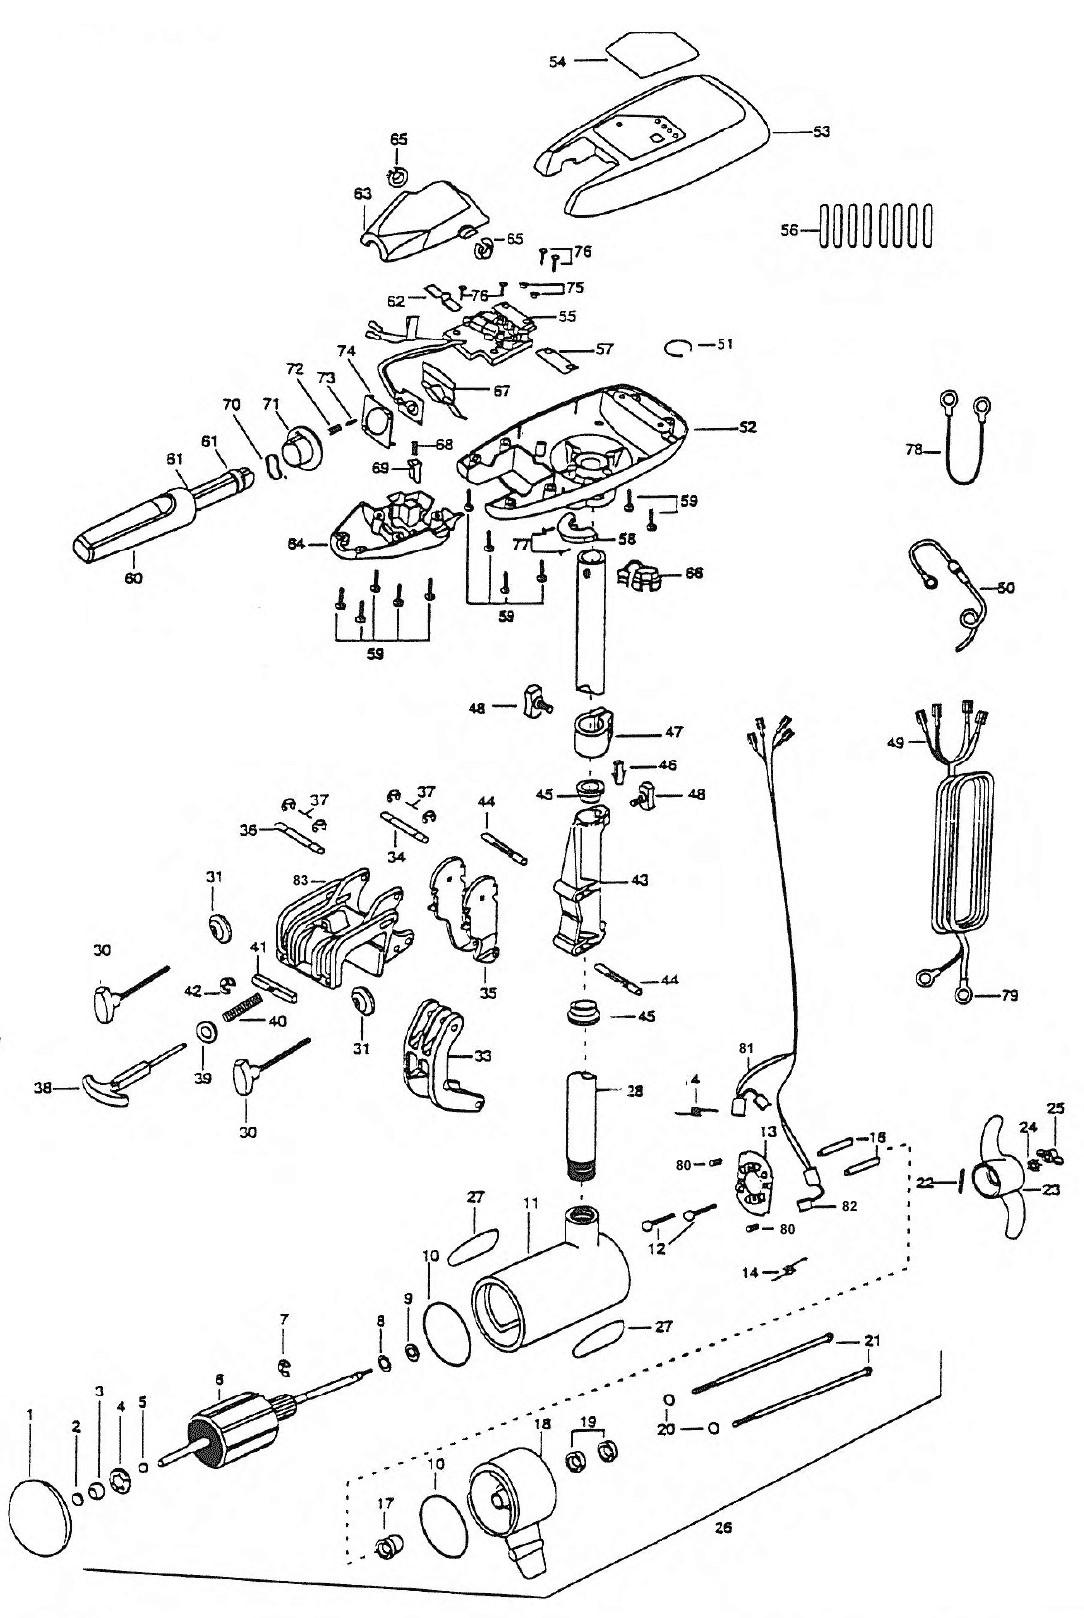 24 volt trolling wiring diagram